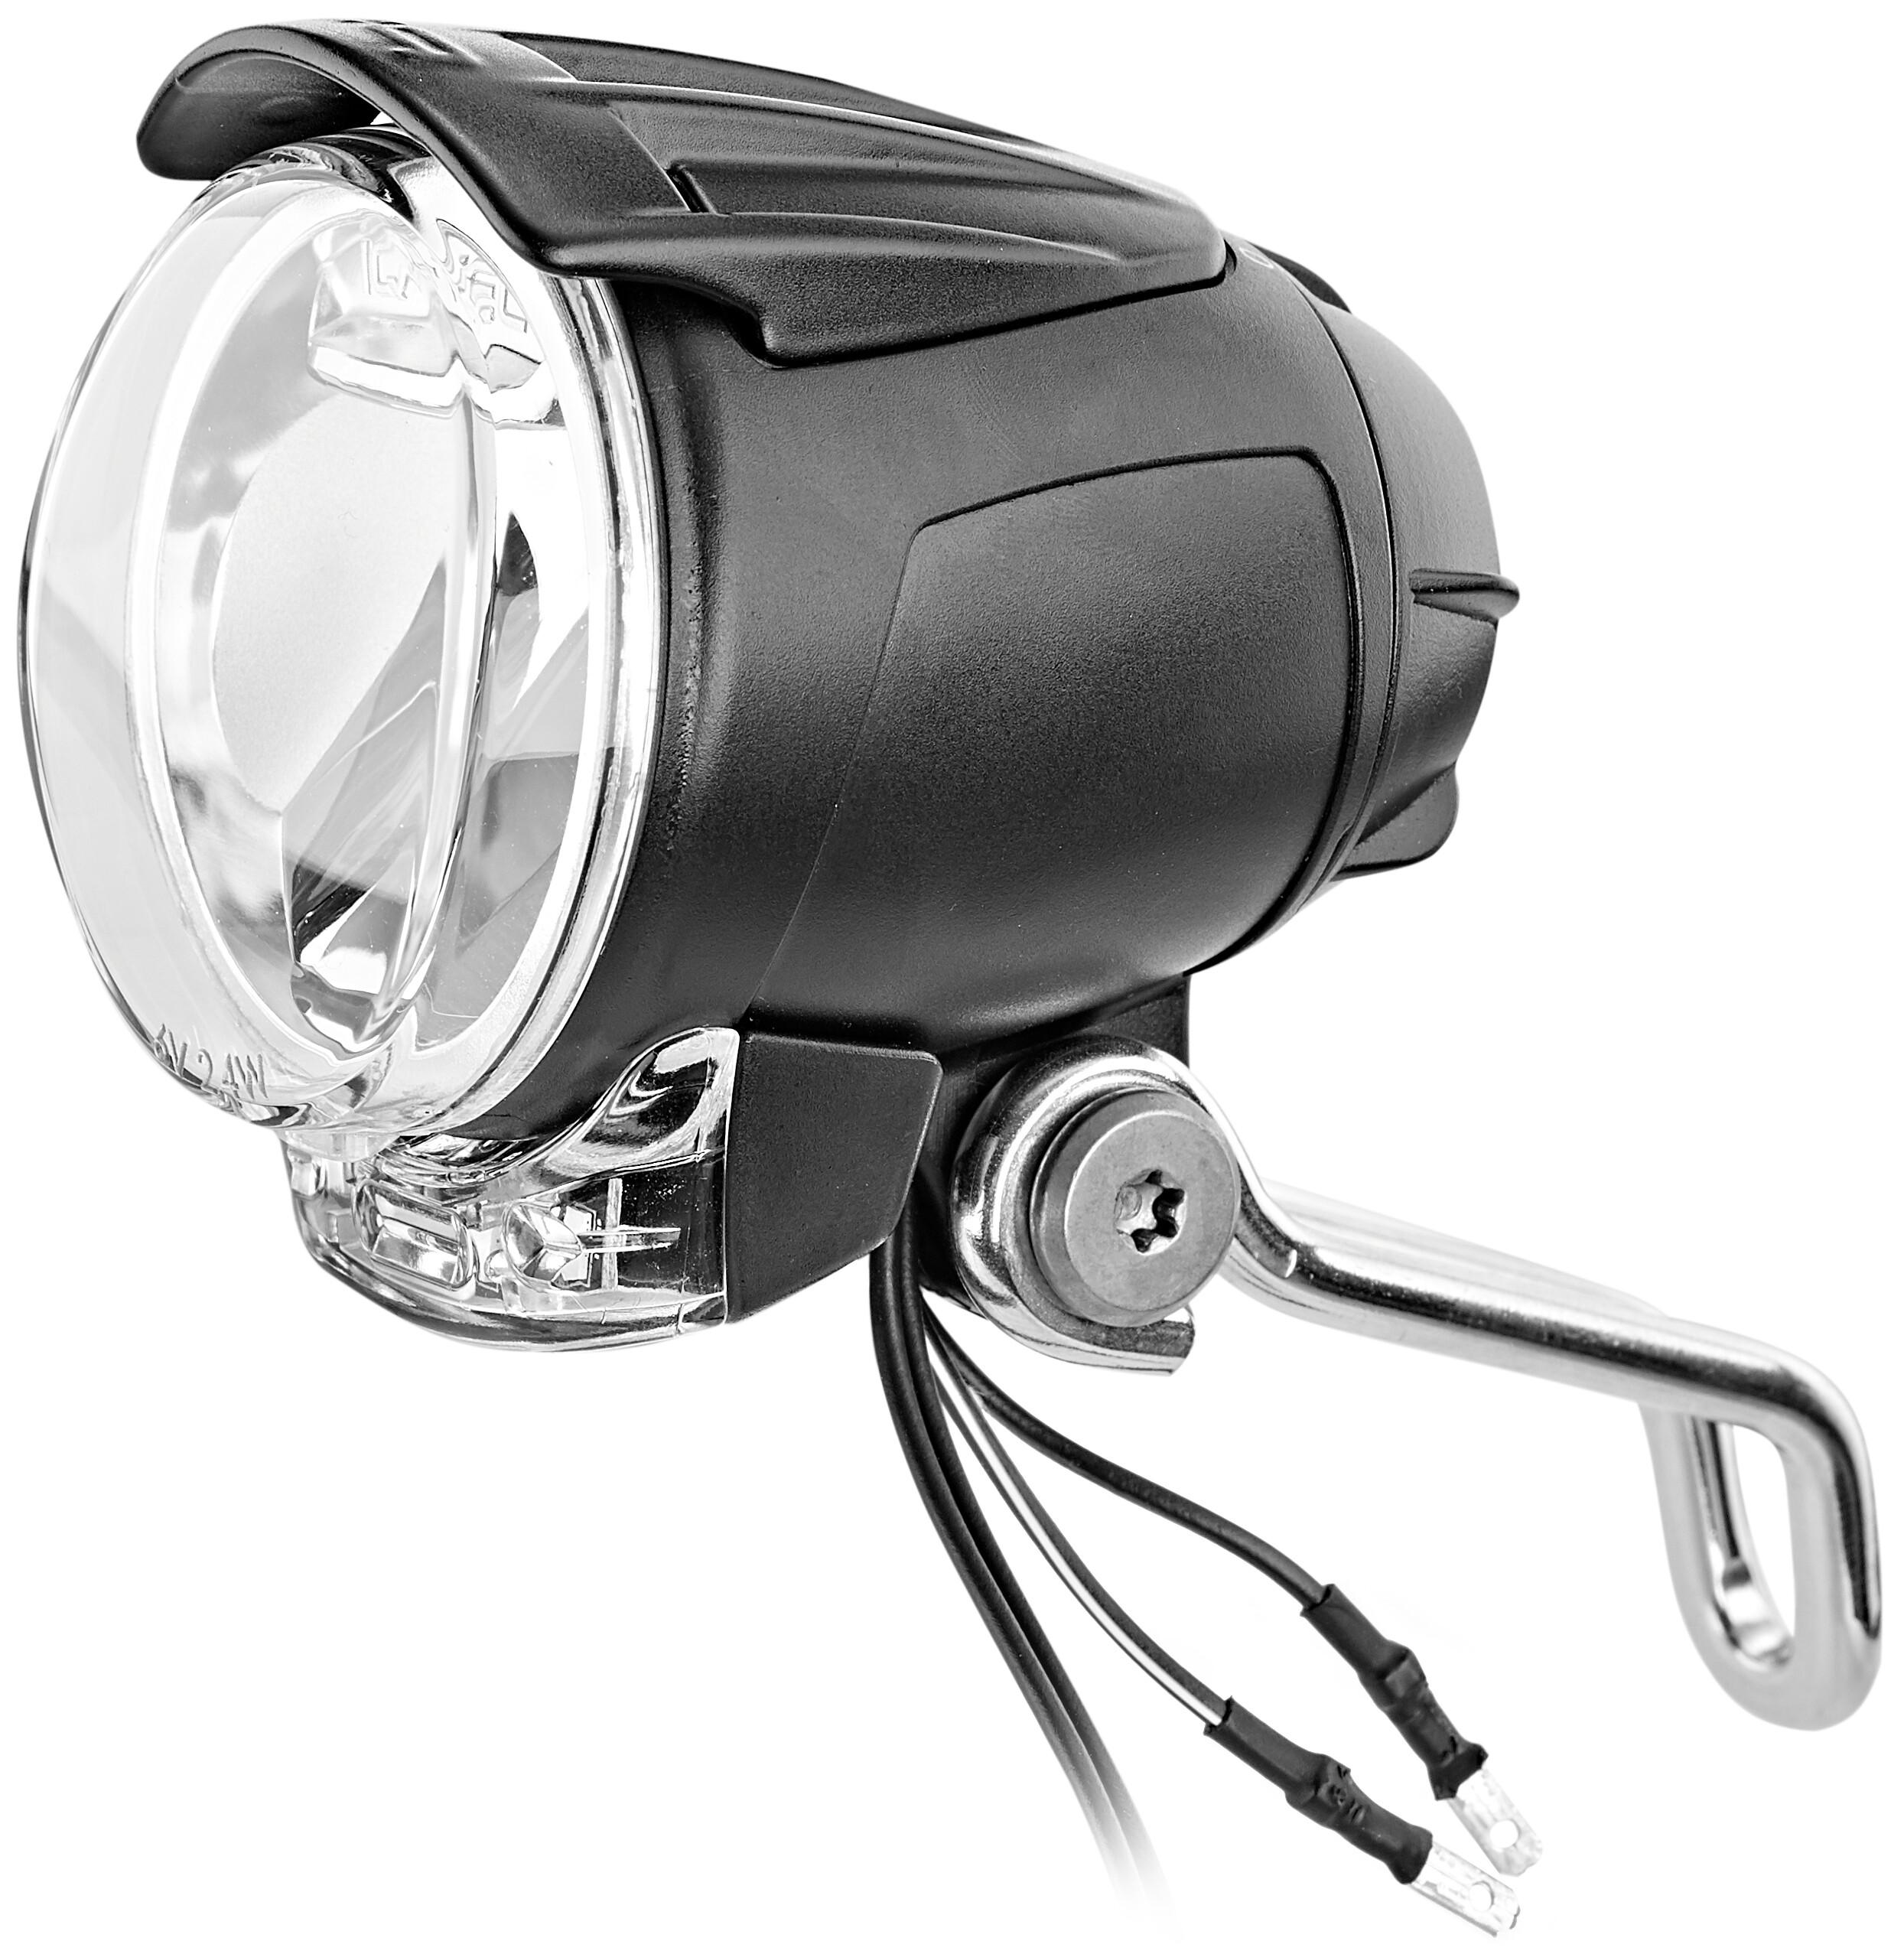 Busch Müller Holder Headlight//Handlebar IXON for all Ø Bicycle Lamp Light